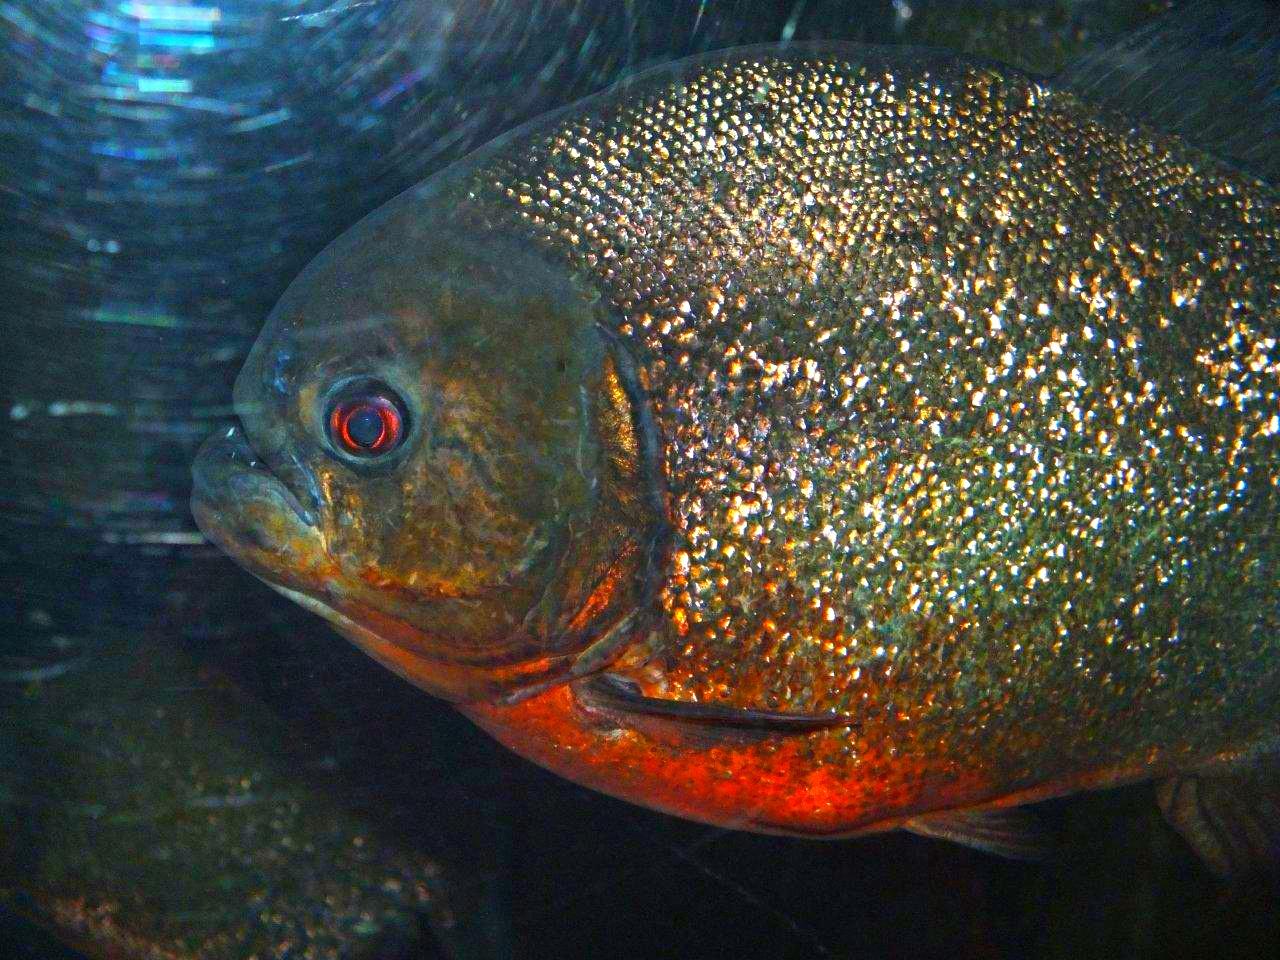 Red-Bellied Piranha ... Shedd Aquarium, Chicago ... photo by Thomas Peace 2013